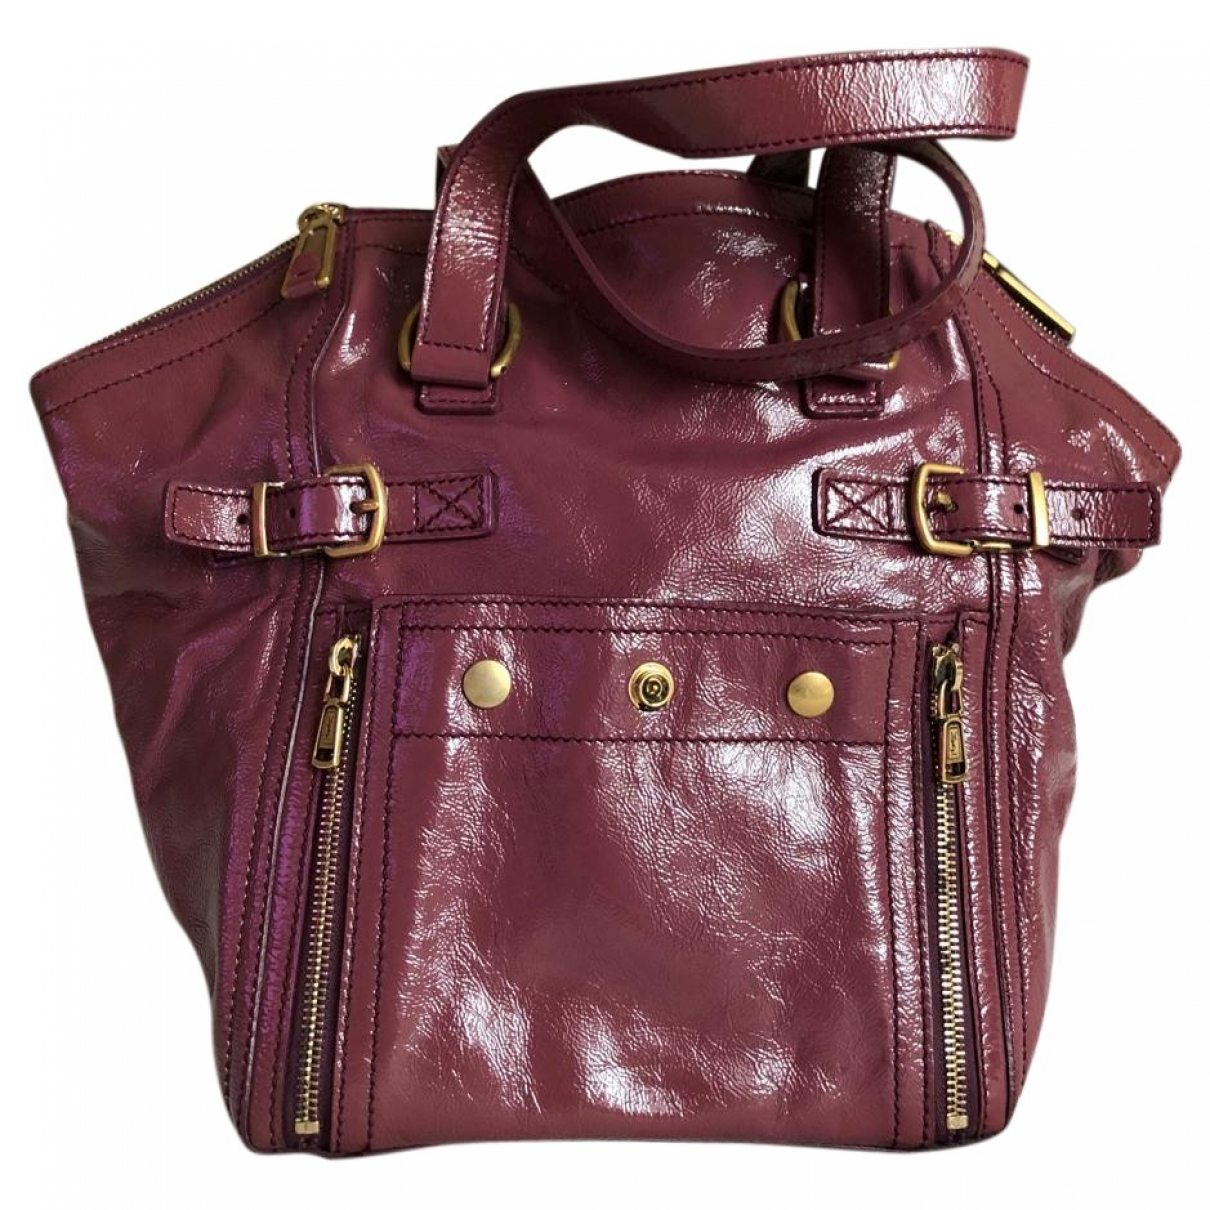 Yves Saint Laurent Downtown Purple Patent leather handbag for Women \N